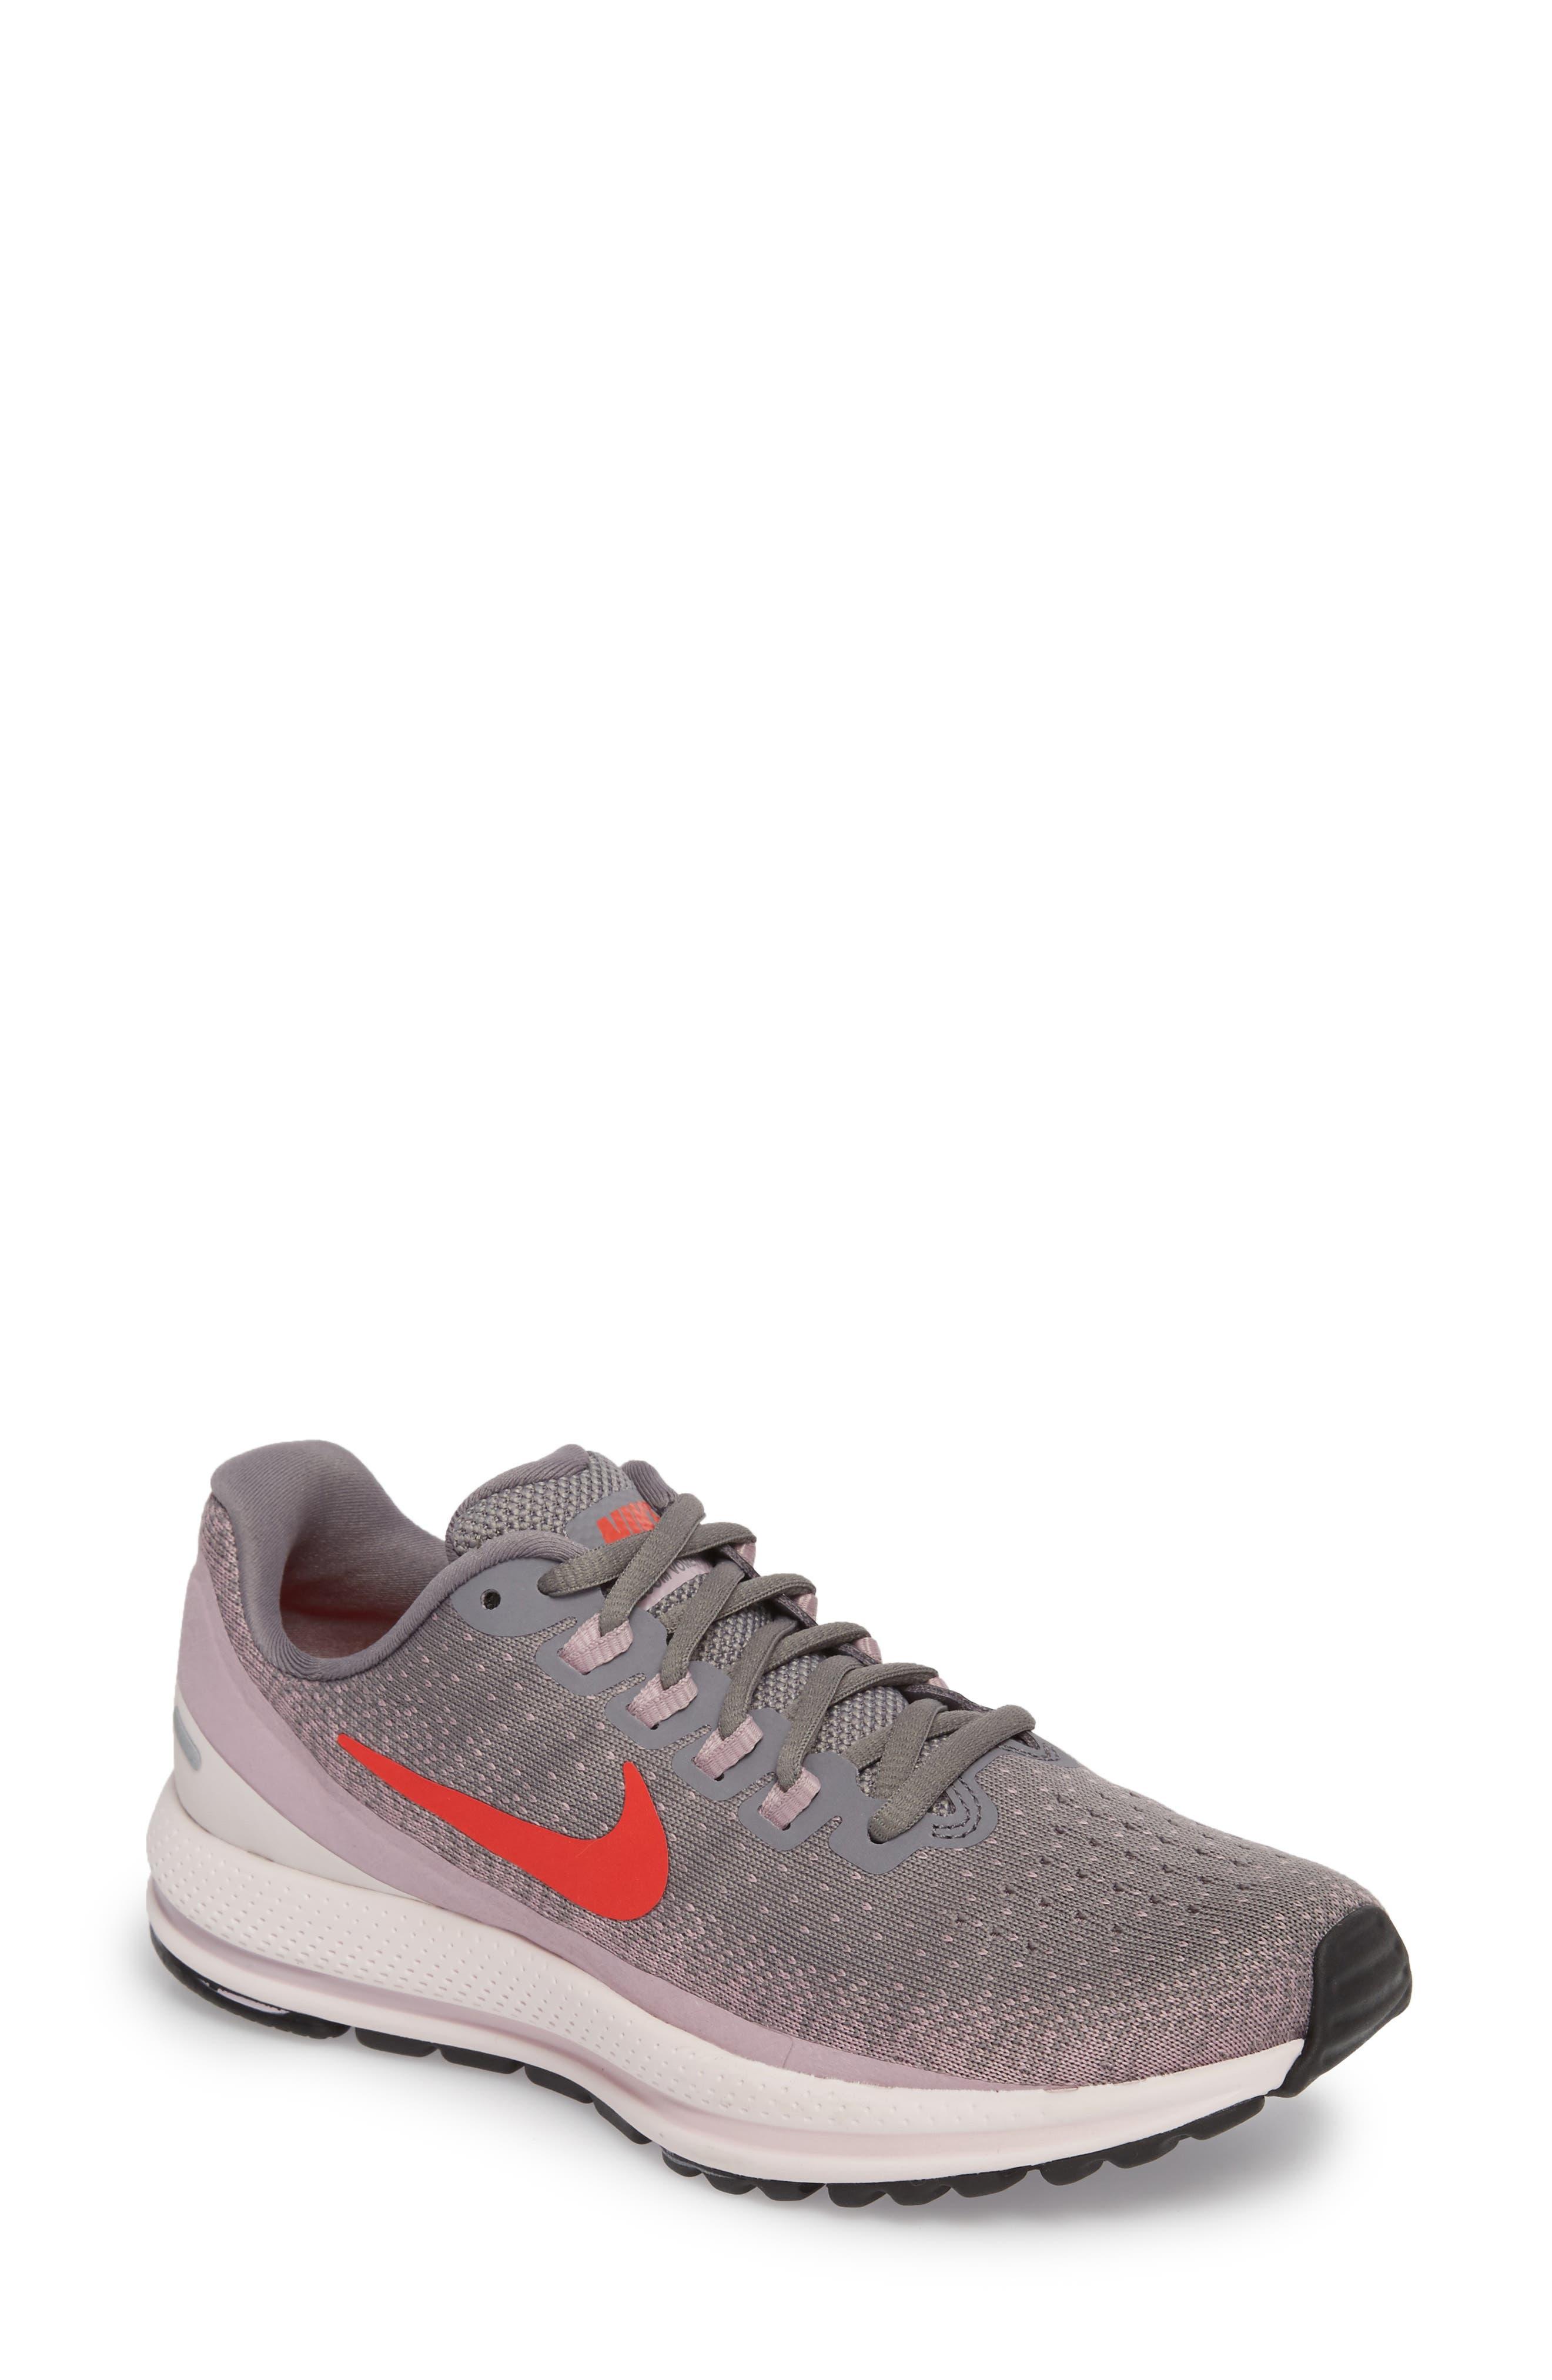 Air Zoom Vomero 13 Running Shoe,                             Main thumbnail 6, color,